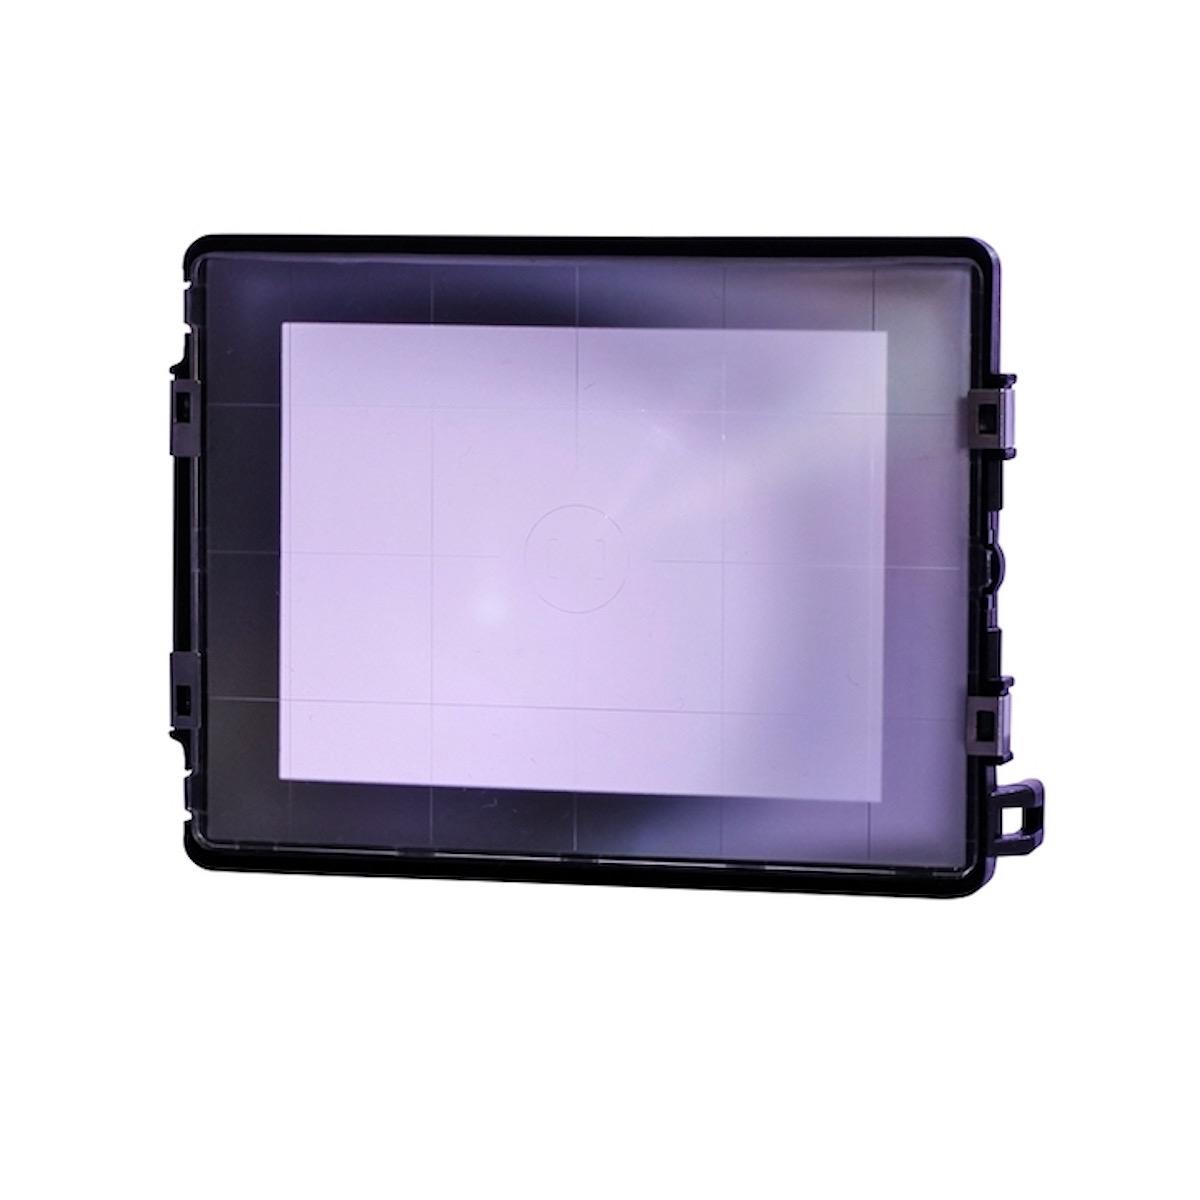 Hasselblad Fokussierscheibe 31/40MP CCD/50MP Raster